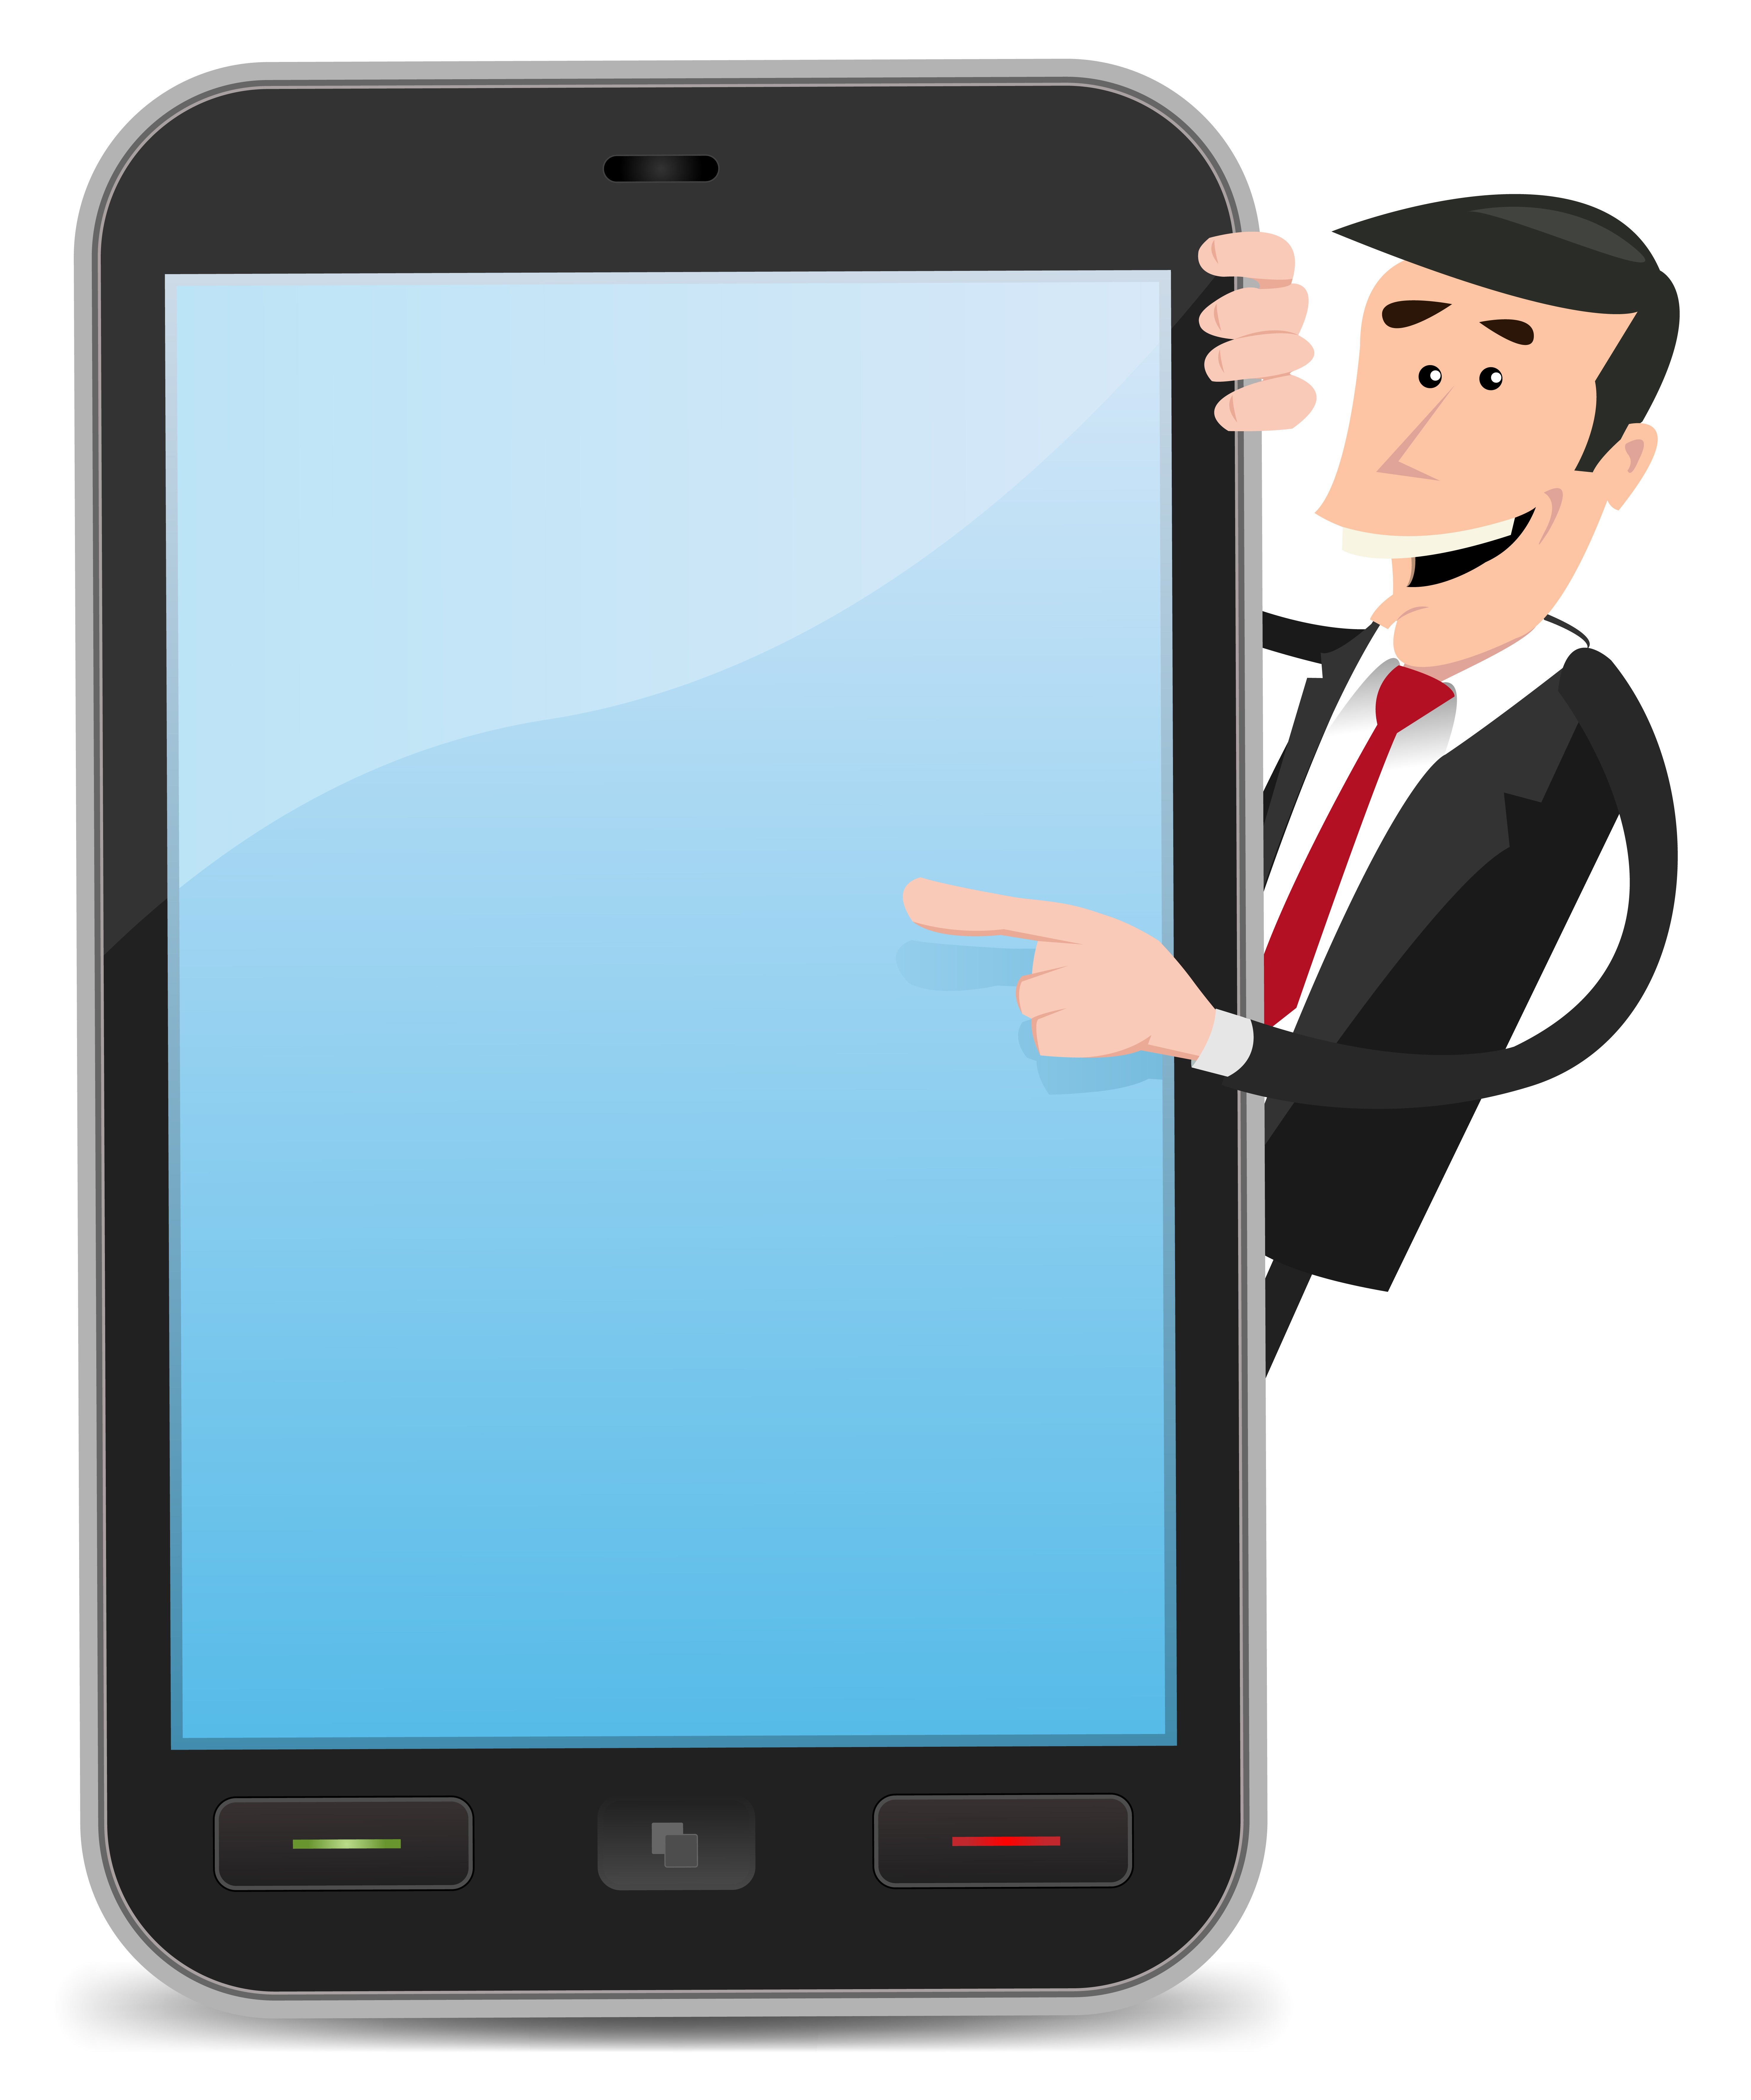 Cartoon Man Pointing Smartphone - Download Free Vectors ...